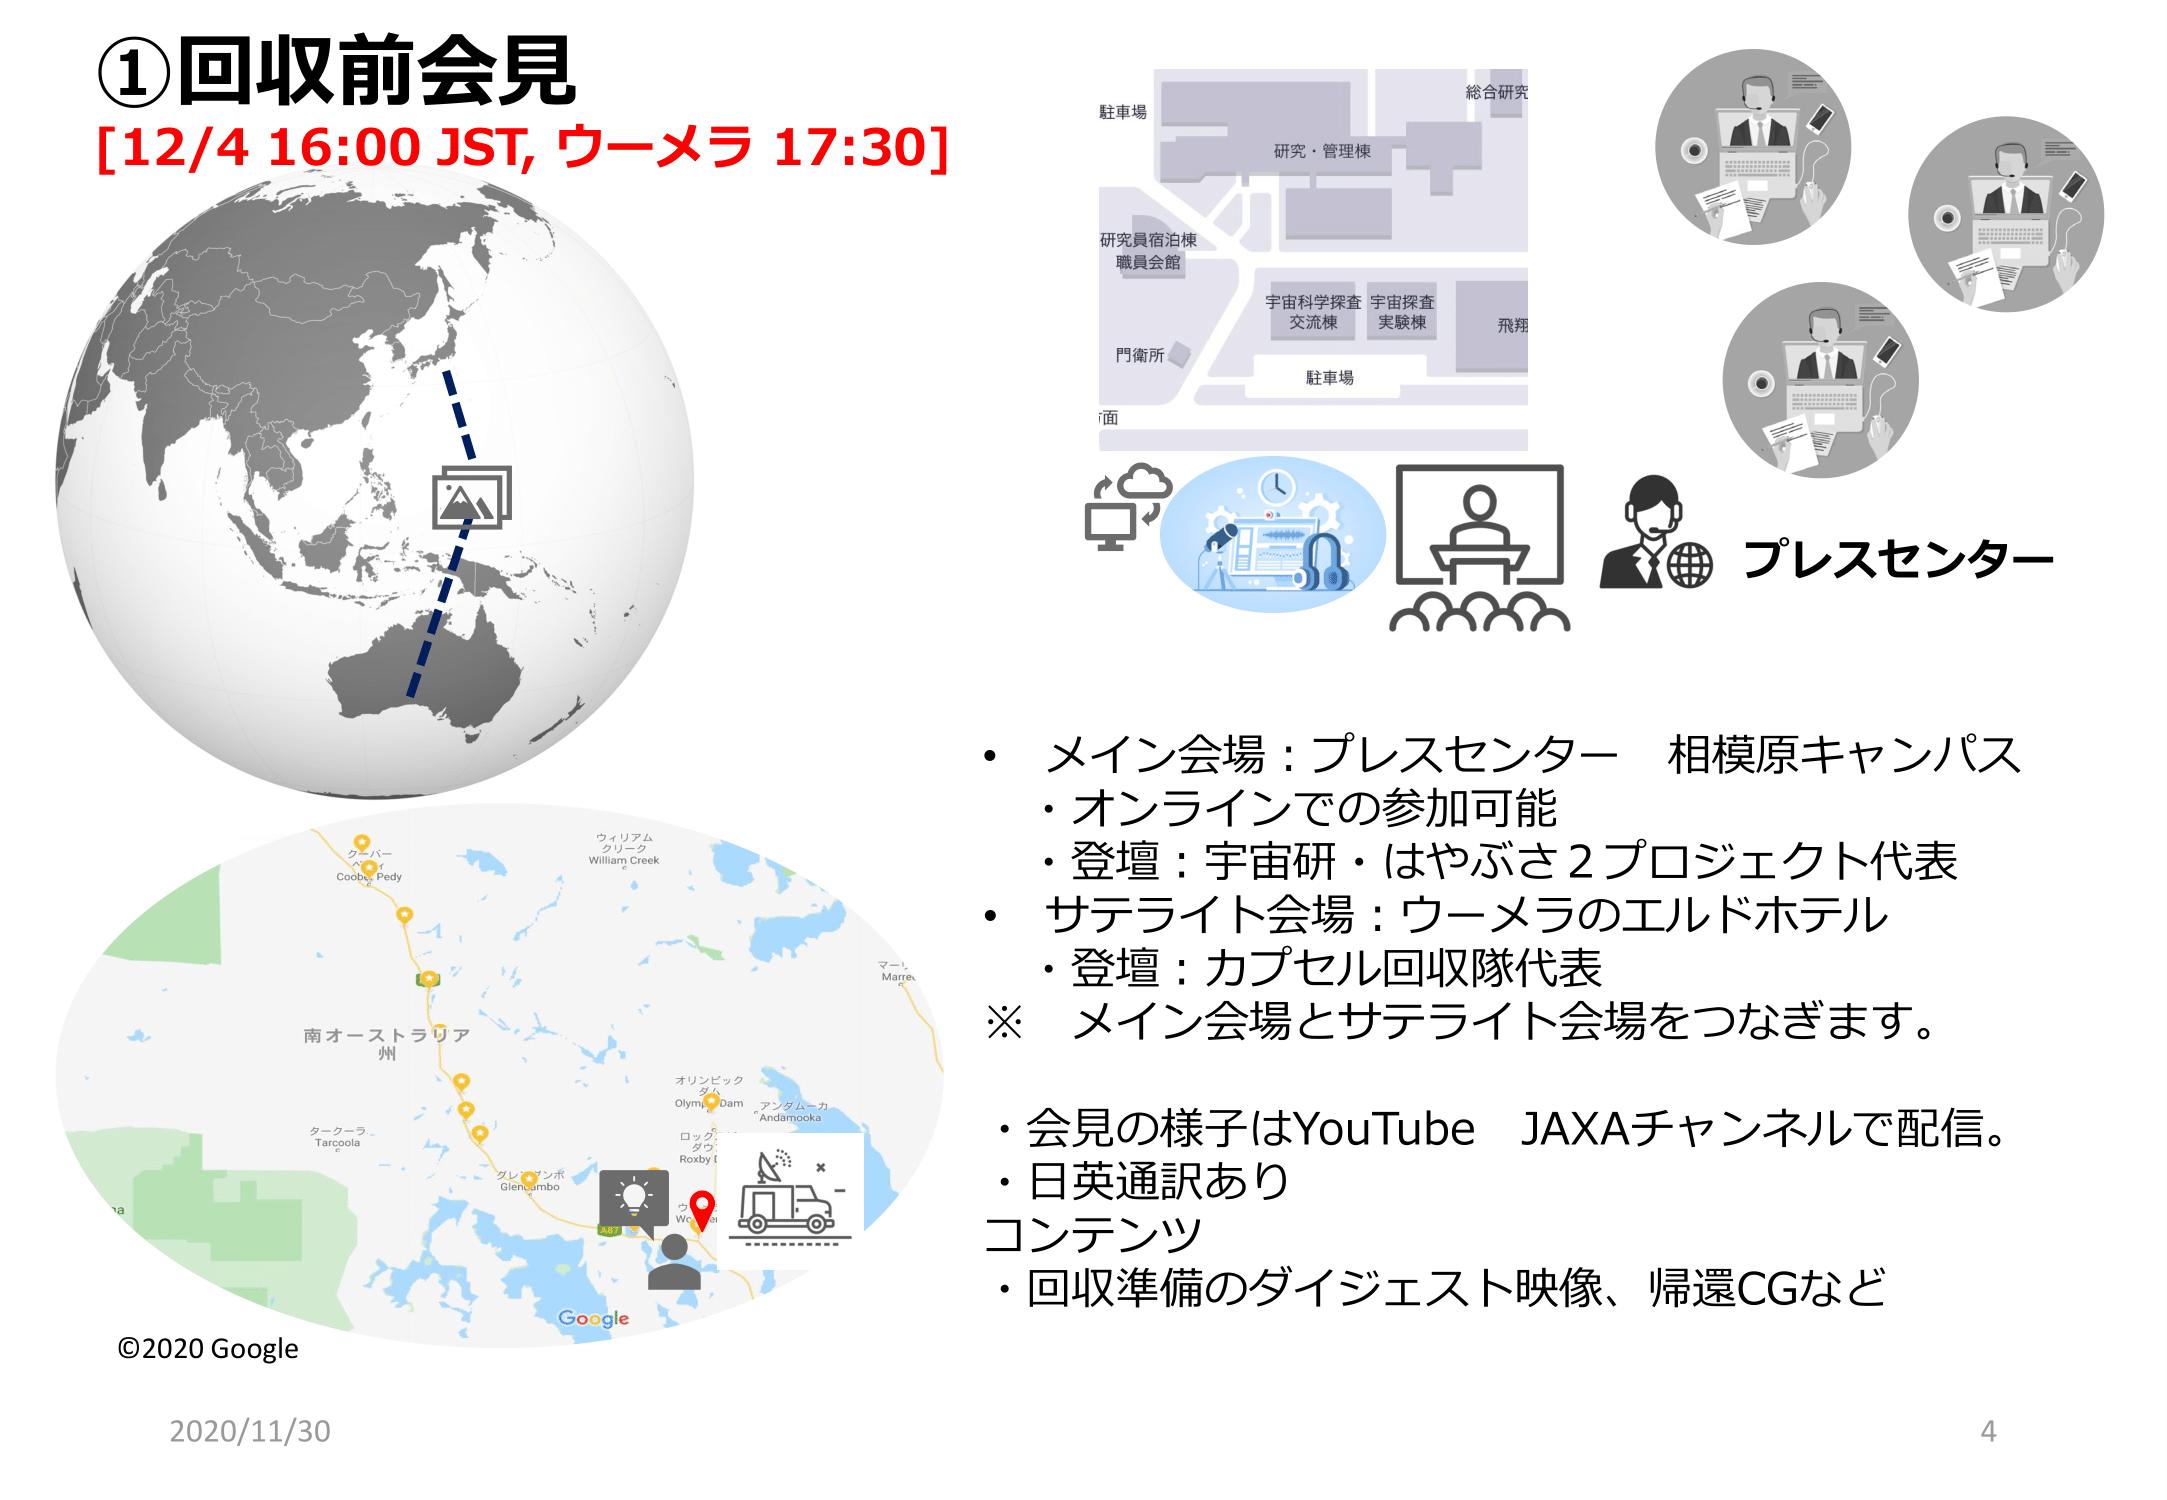 f:id:Imamura:20201130154325p:plain:h250